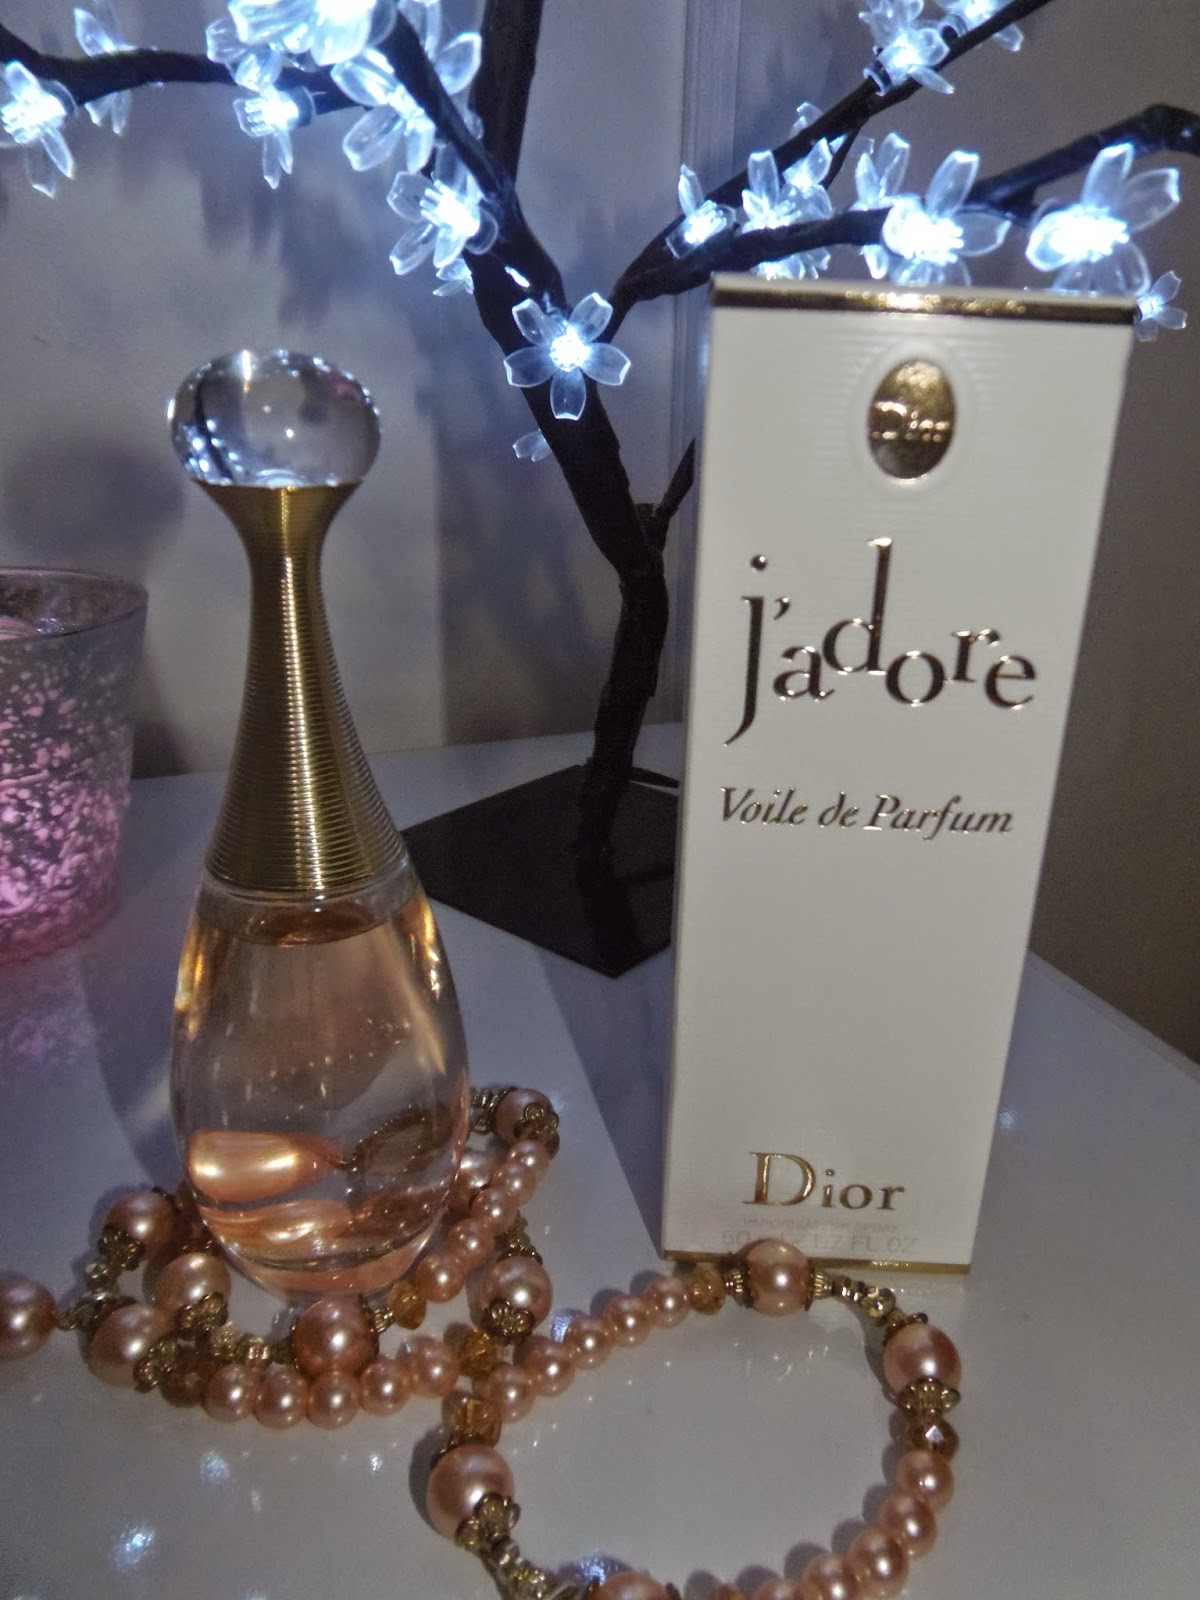 Perfume J'Adore da Dior